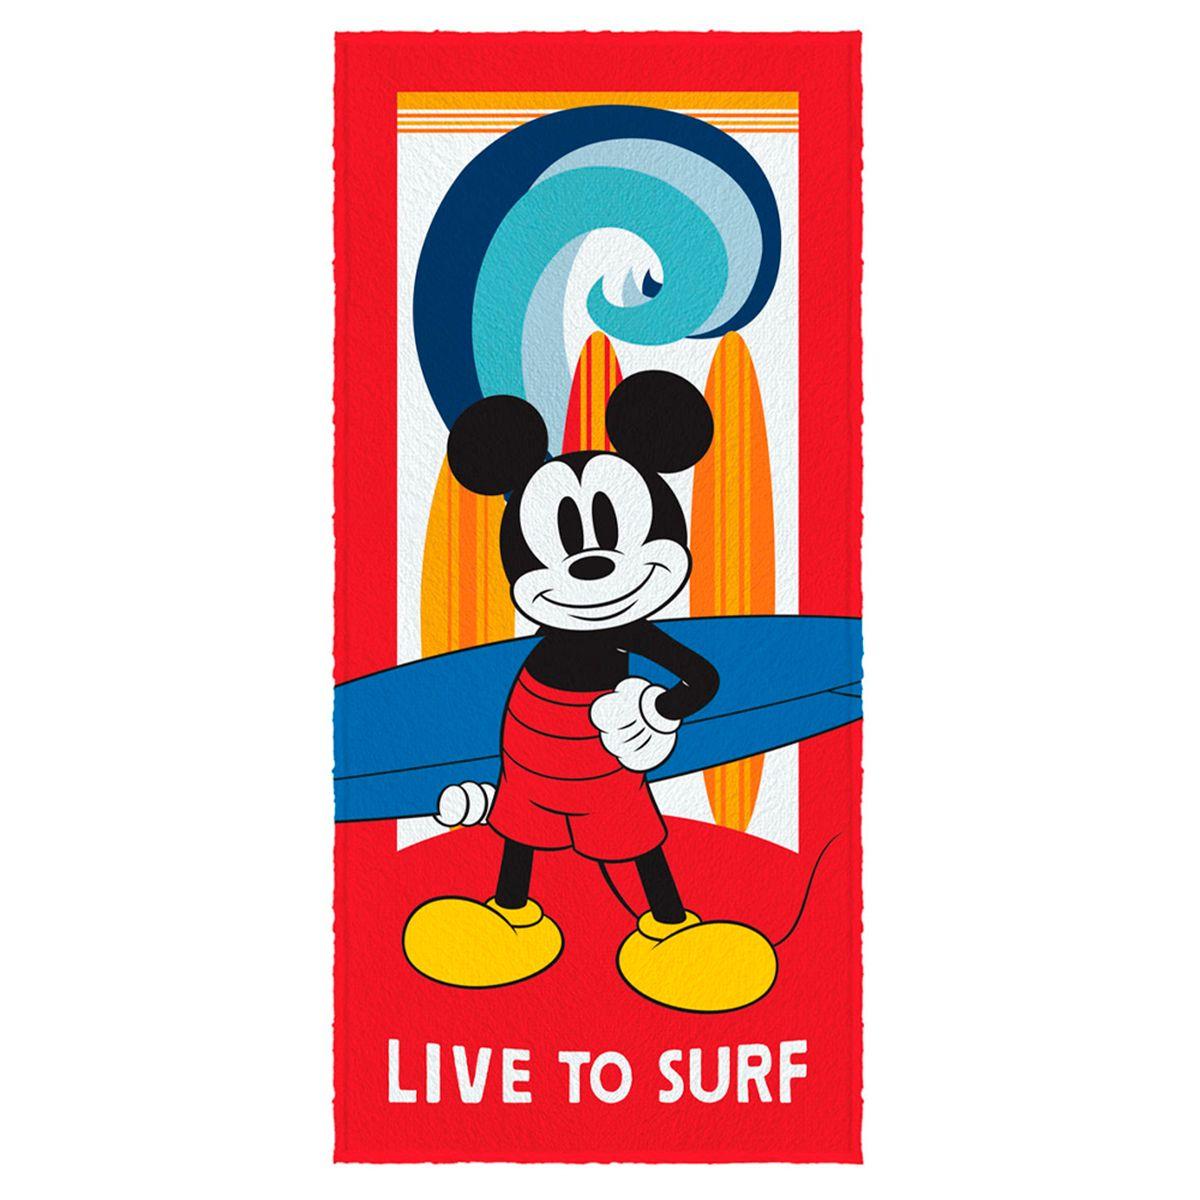 Toalha de Banho Felpuda infantil Mickey Mod 5